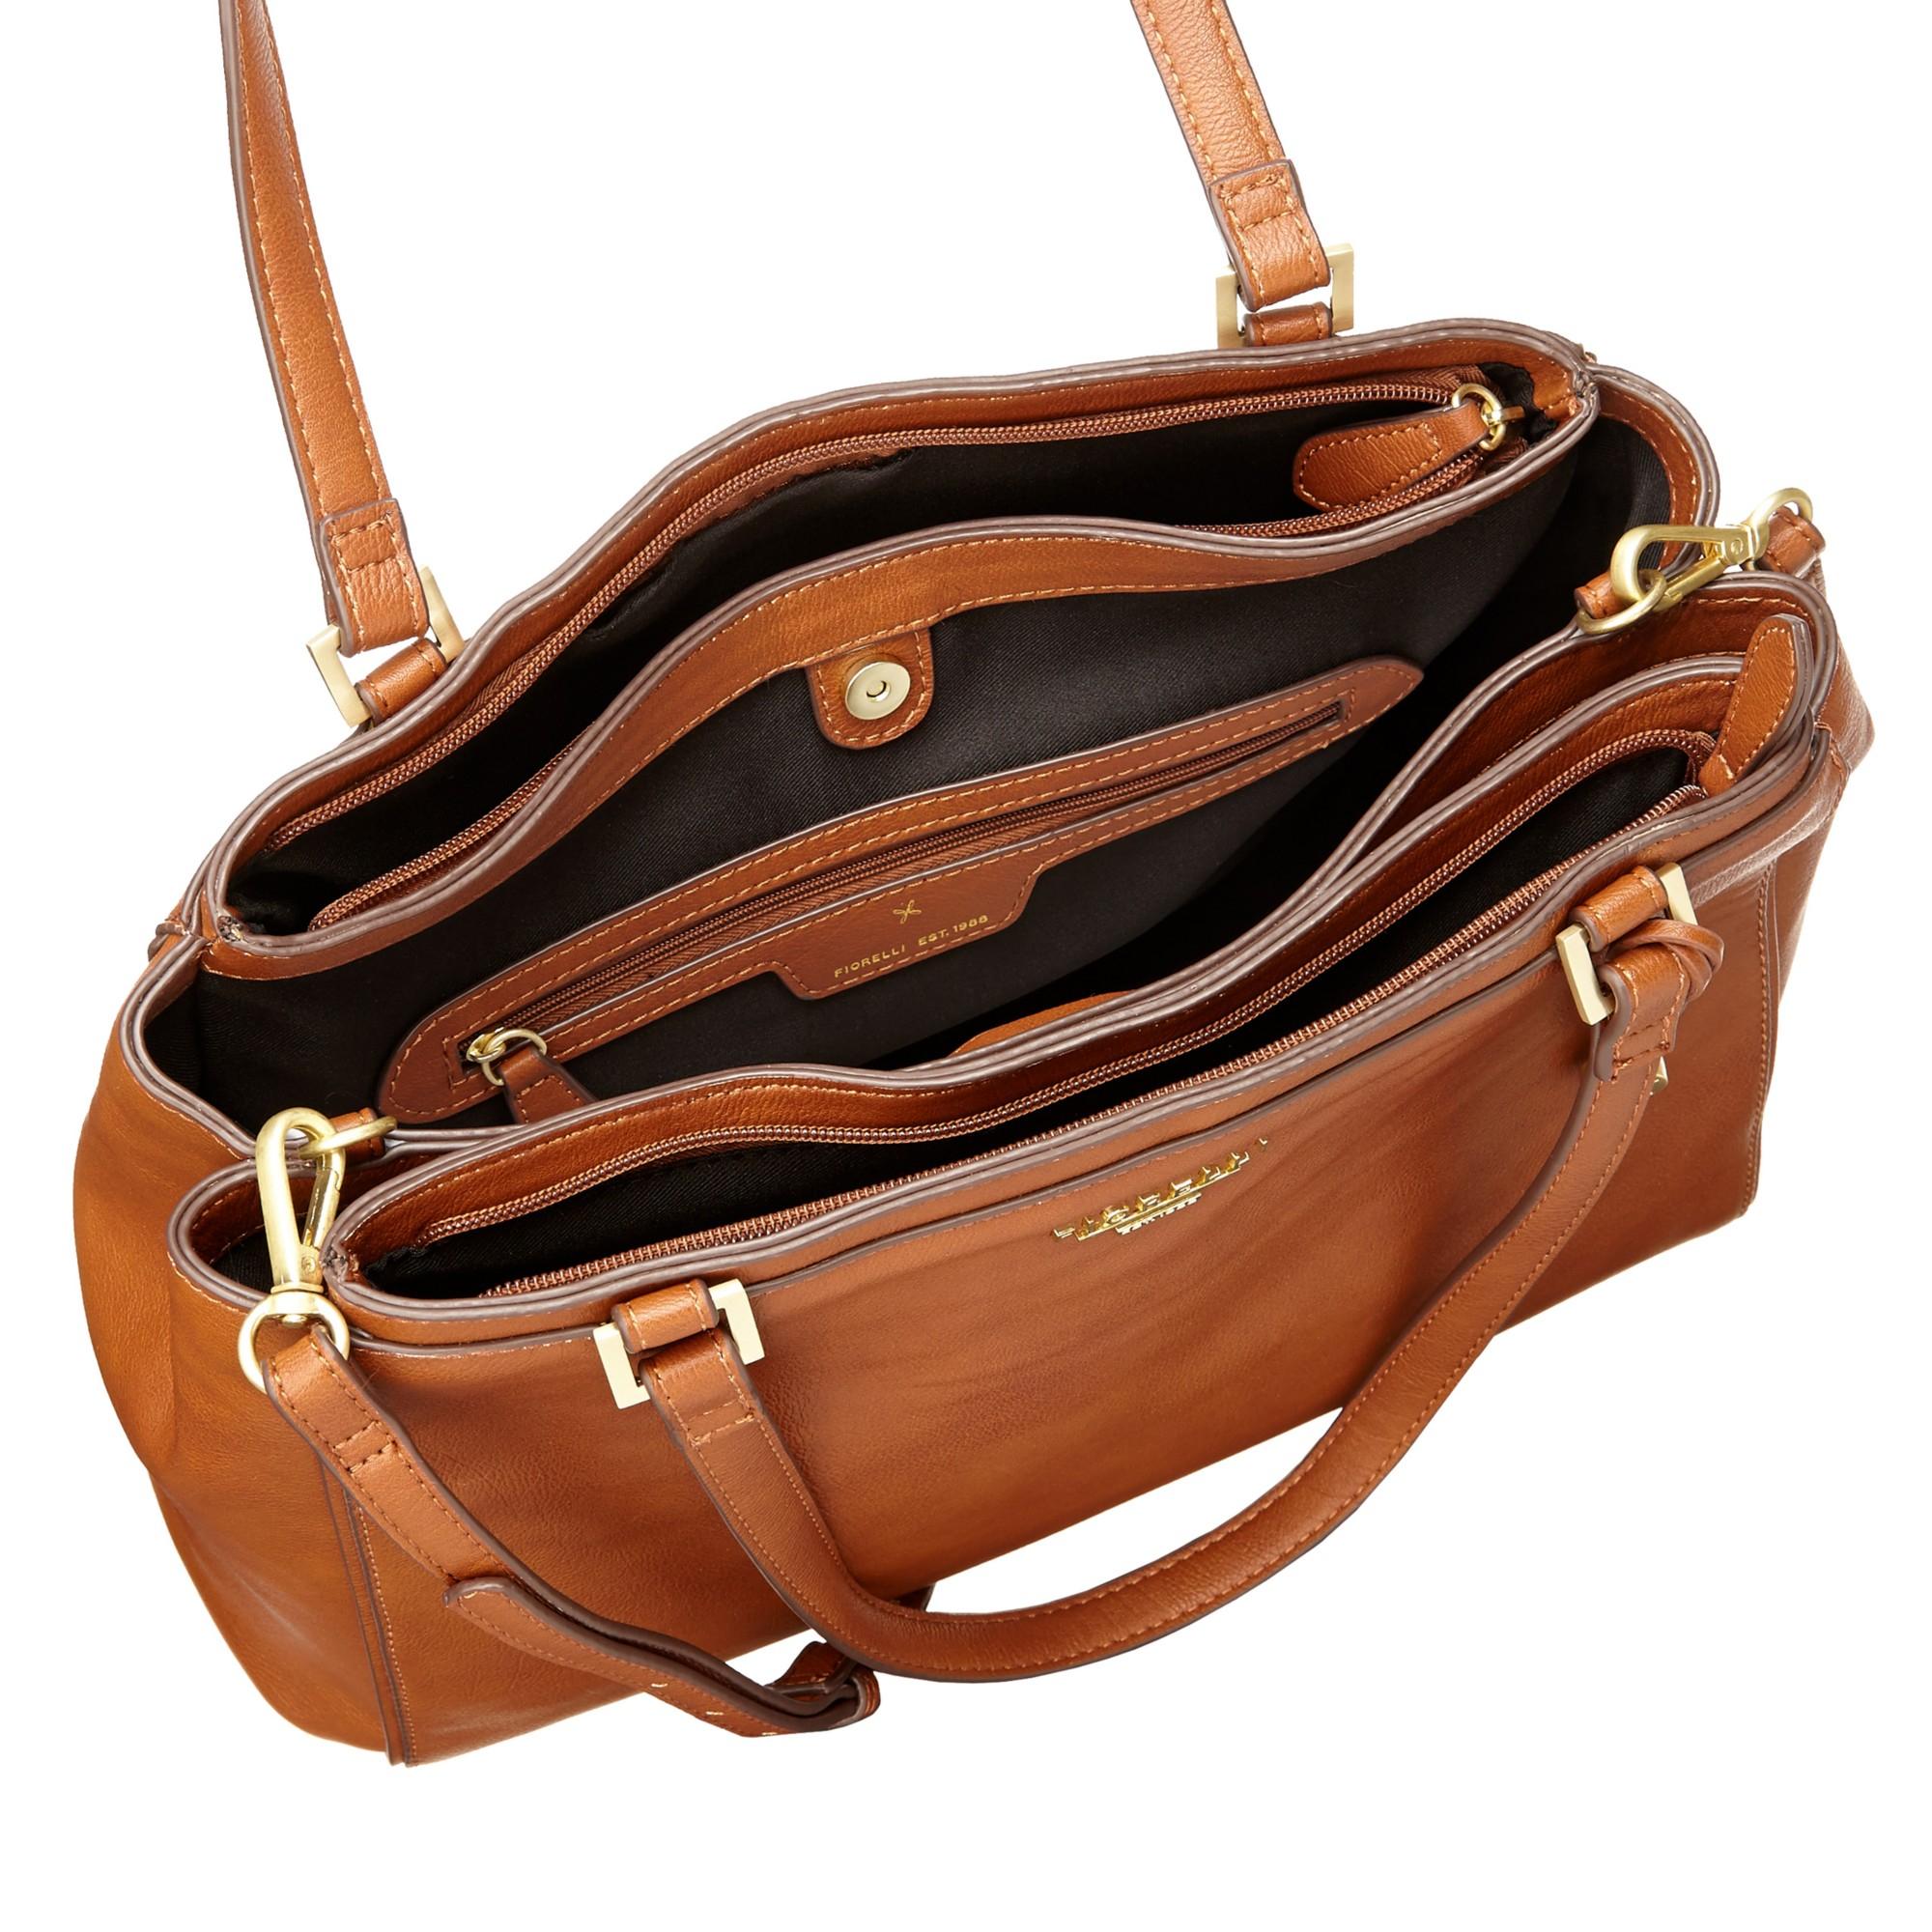 c709eb8357 Fiorelli Sophia Large Shoulder Bag in Brown - Lyst